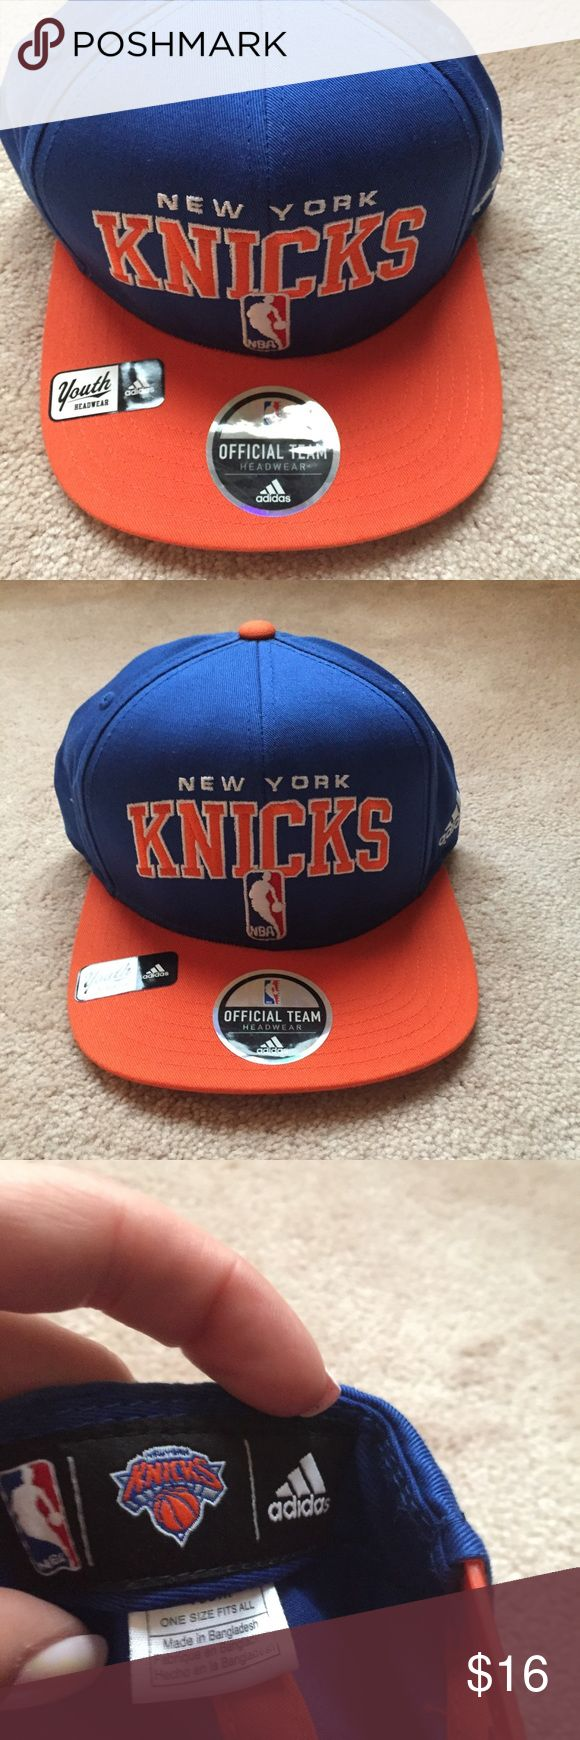 New York Knicks Adidas SnapBack ✔️ one size fits all youth New York Knicks hat ✔️ EUC ✔️ still has all original stickers on it adidas Accessories Hats